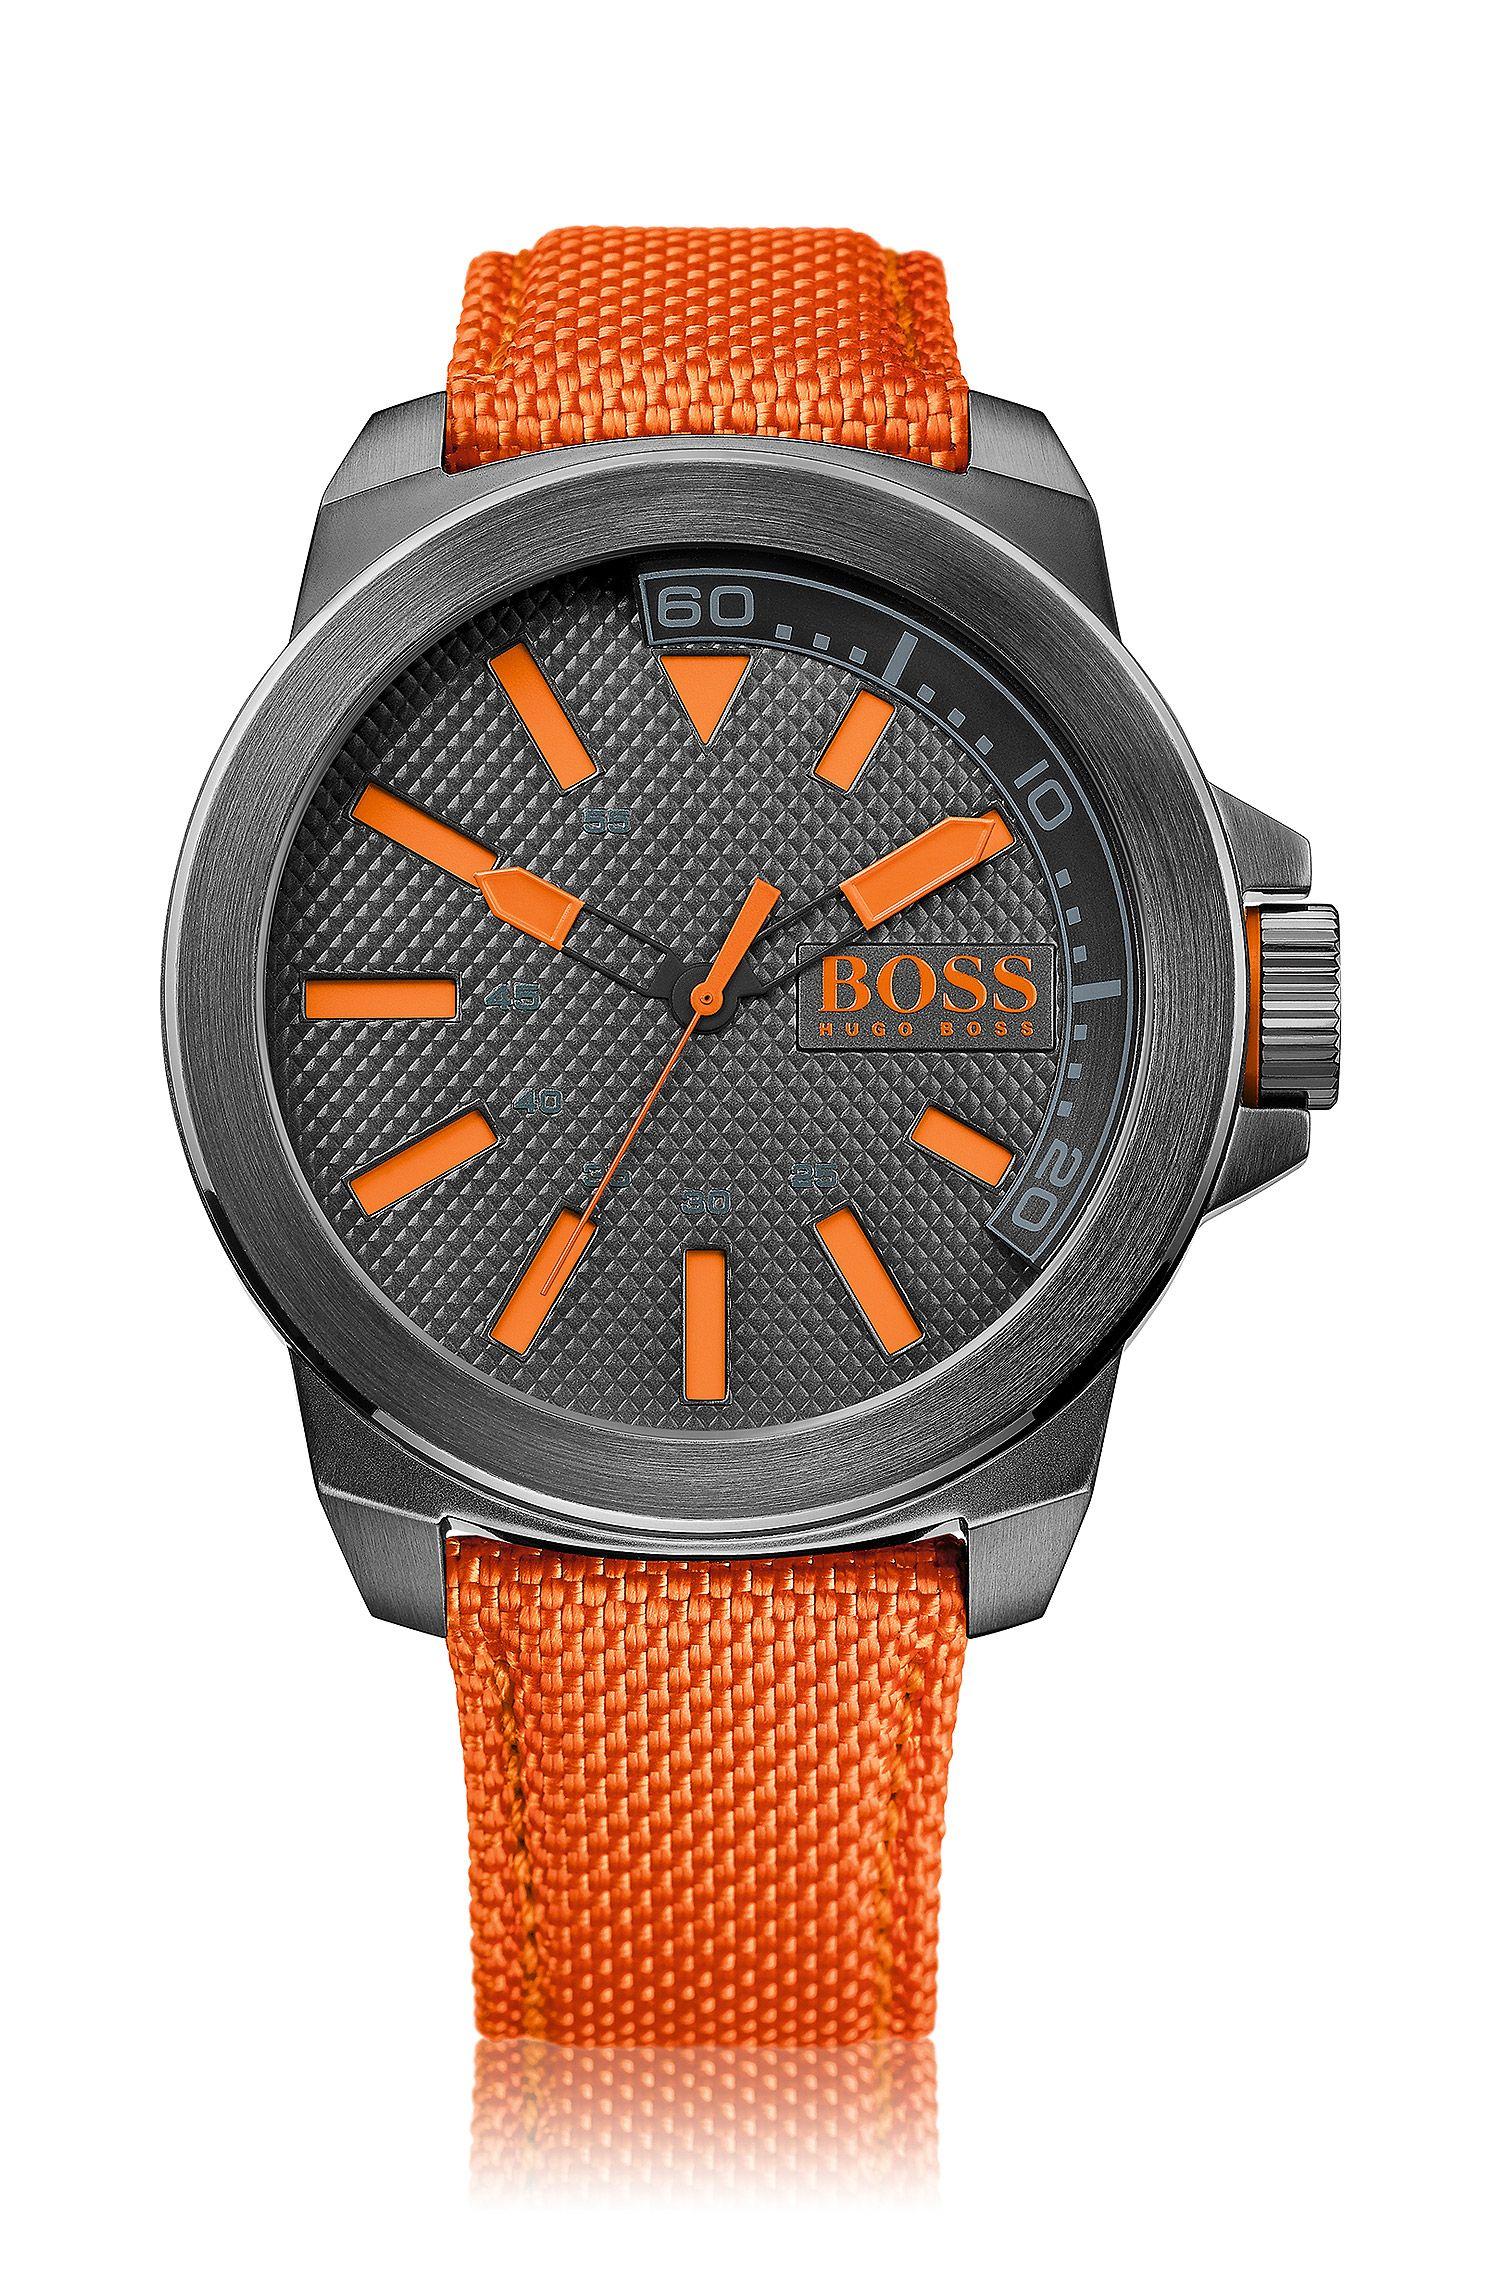 Montre-bracelet «HO7010» avec bracelet en tissu